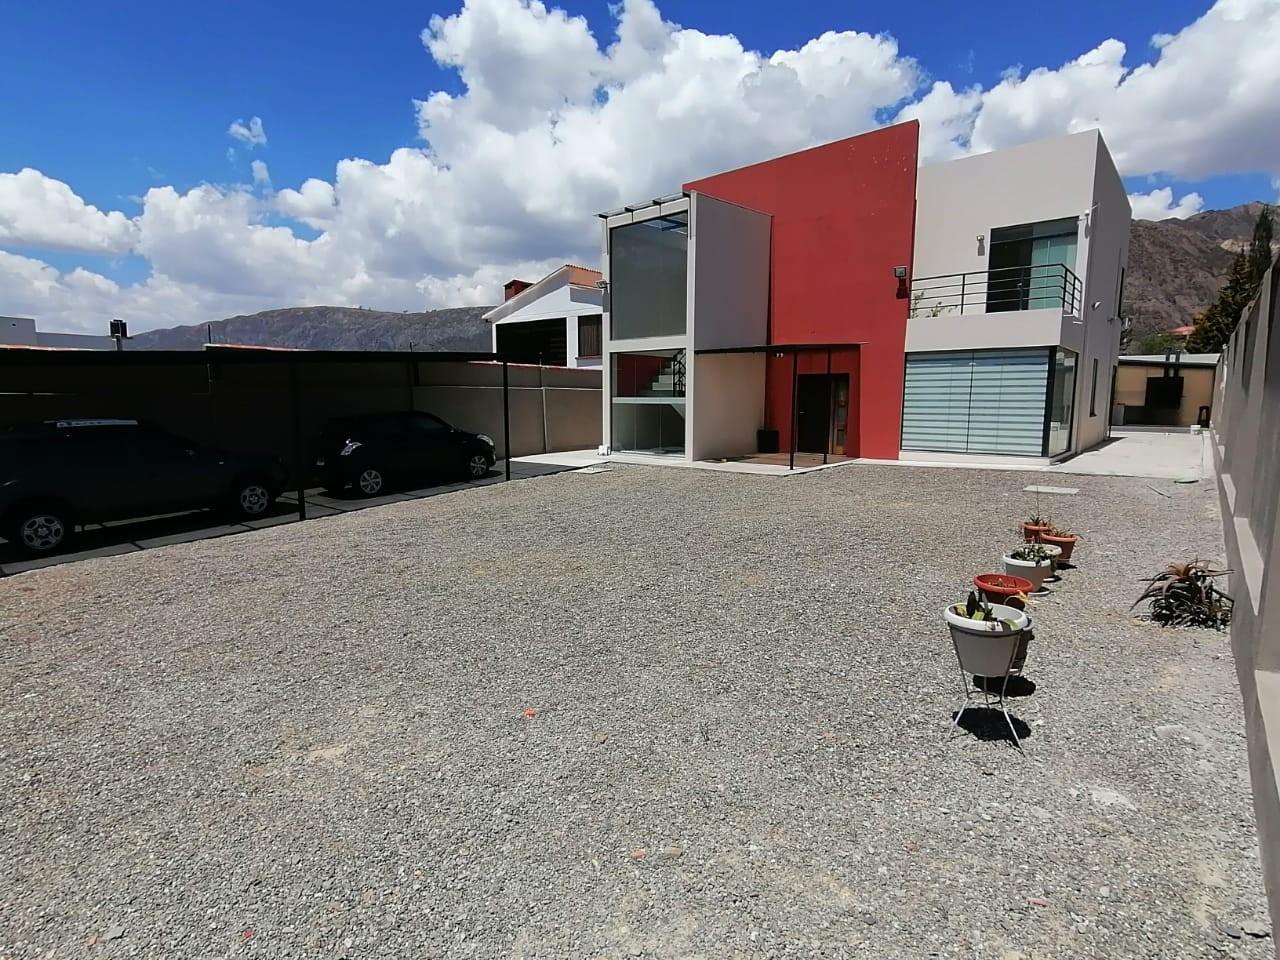 Casa en Venta $us.250.000.- LINDA CASA EN VENTA JUPAPINA 653 mtrs DE TERRENO LPZ Foto 1